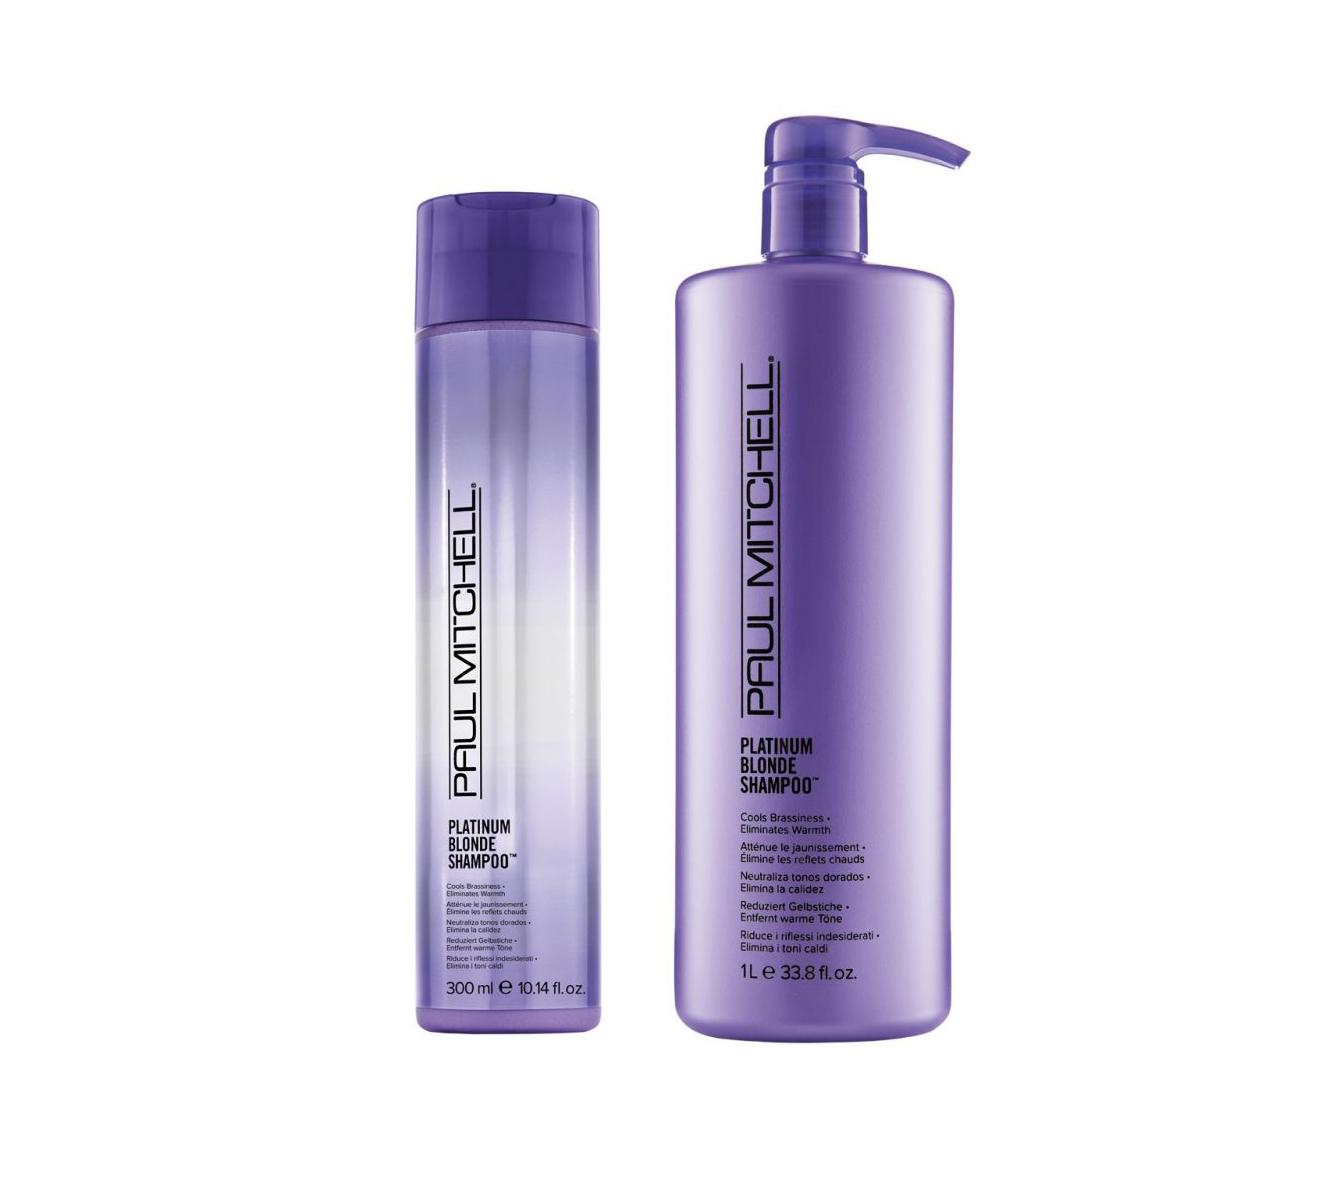 Paul Mitchell Platinum Blonde Shampoo - šampon pro blond a šedivé vlasy